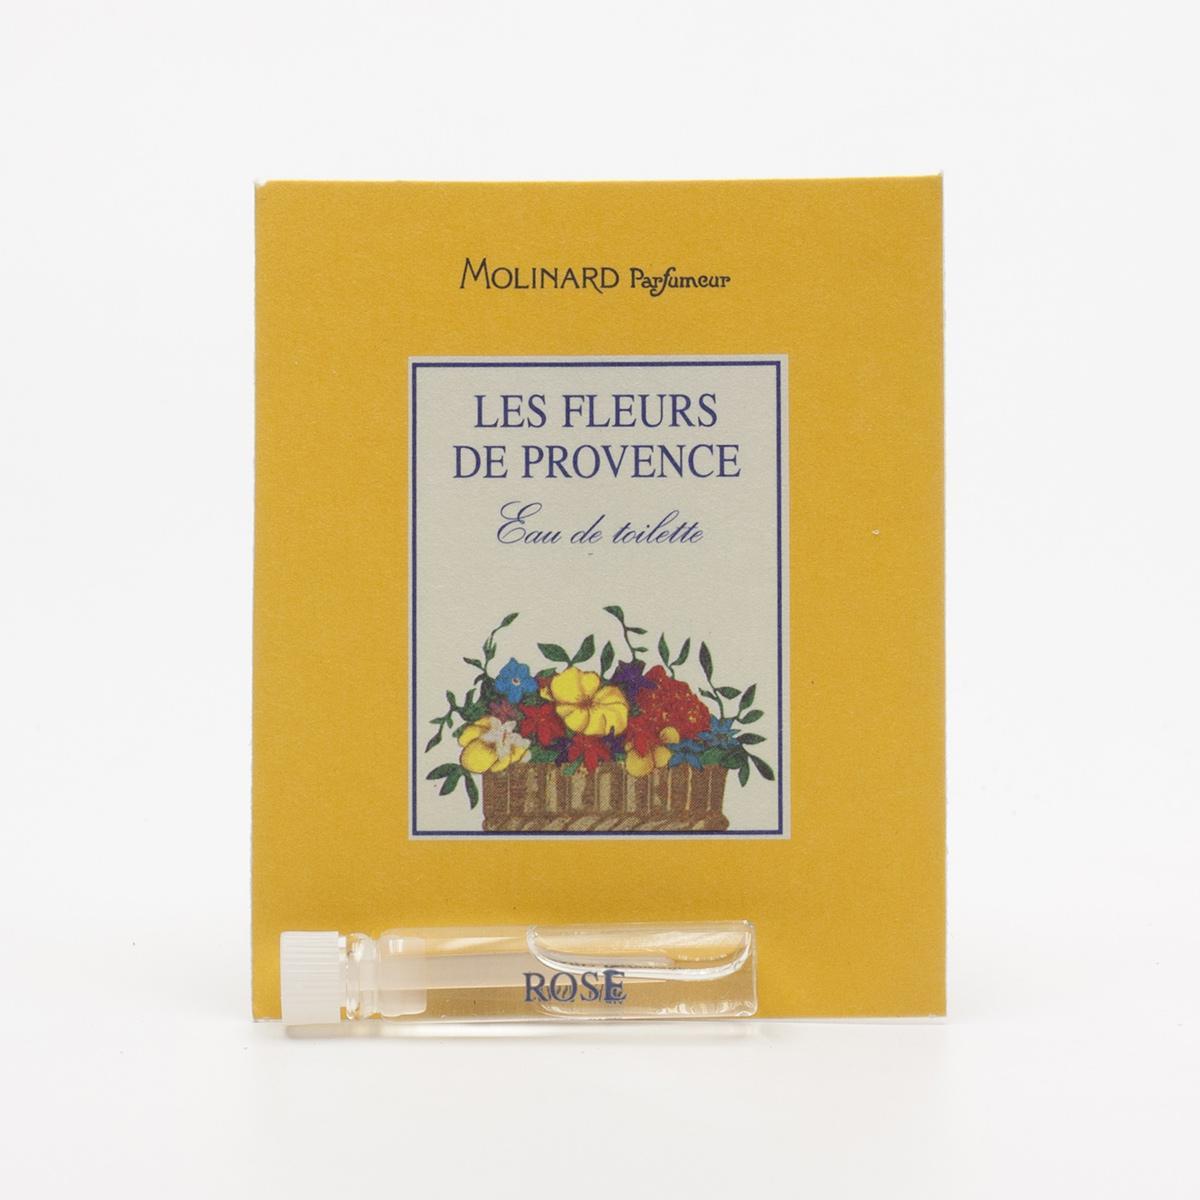 Molinard Toaletní voda Les Fleurs de Provence Rose 1 ml